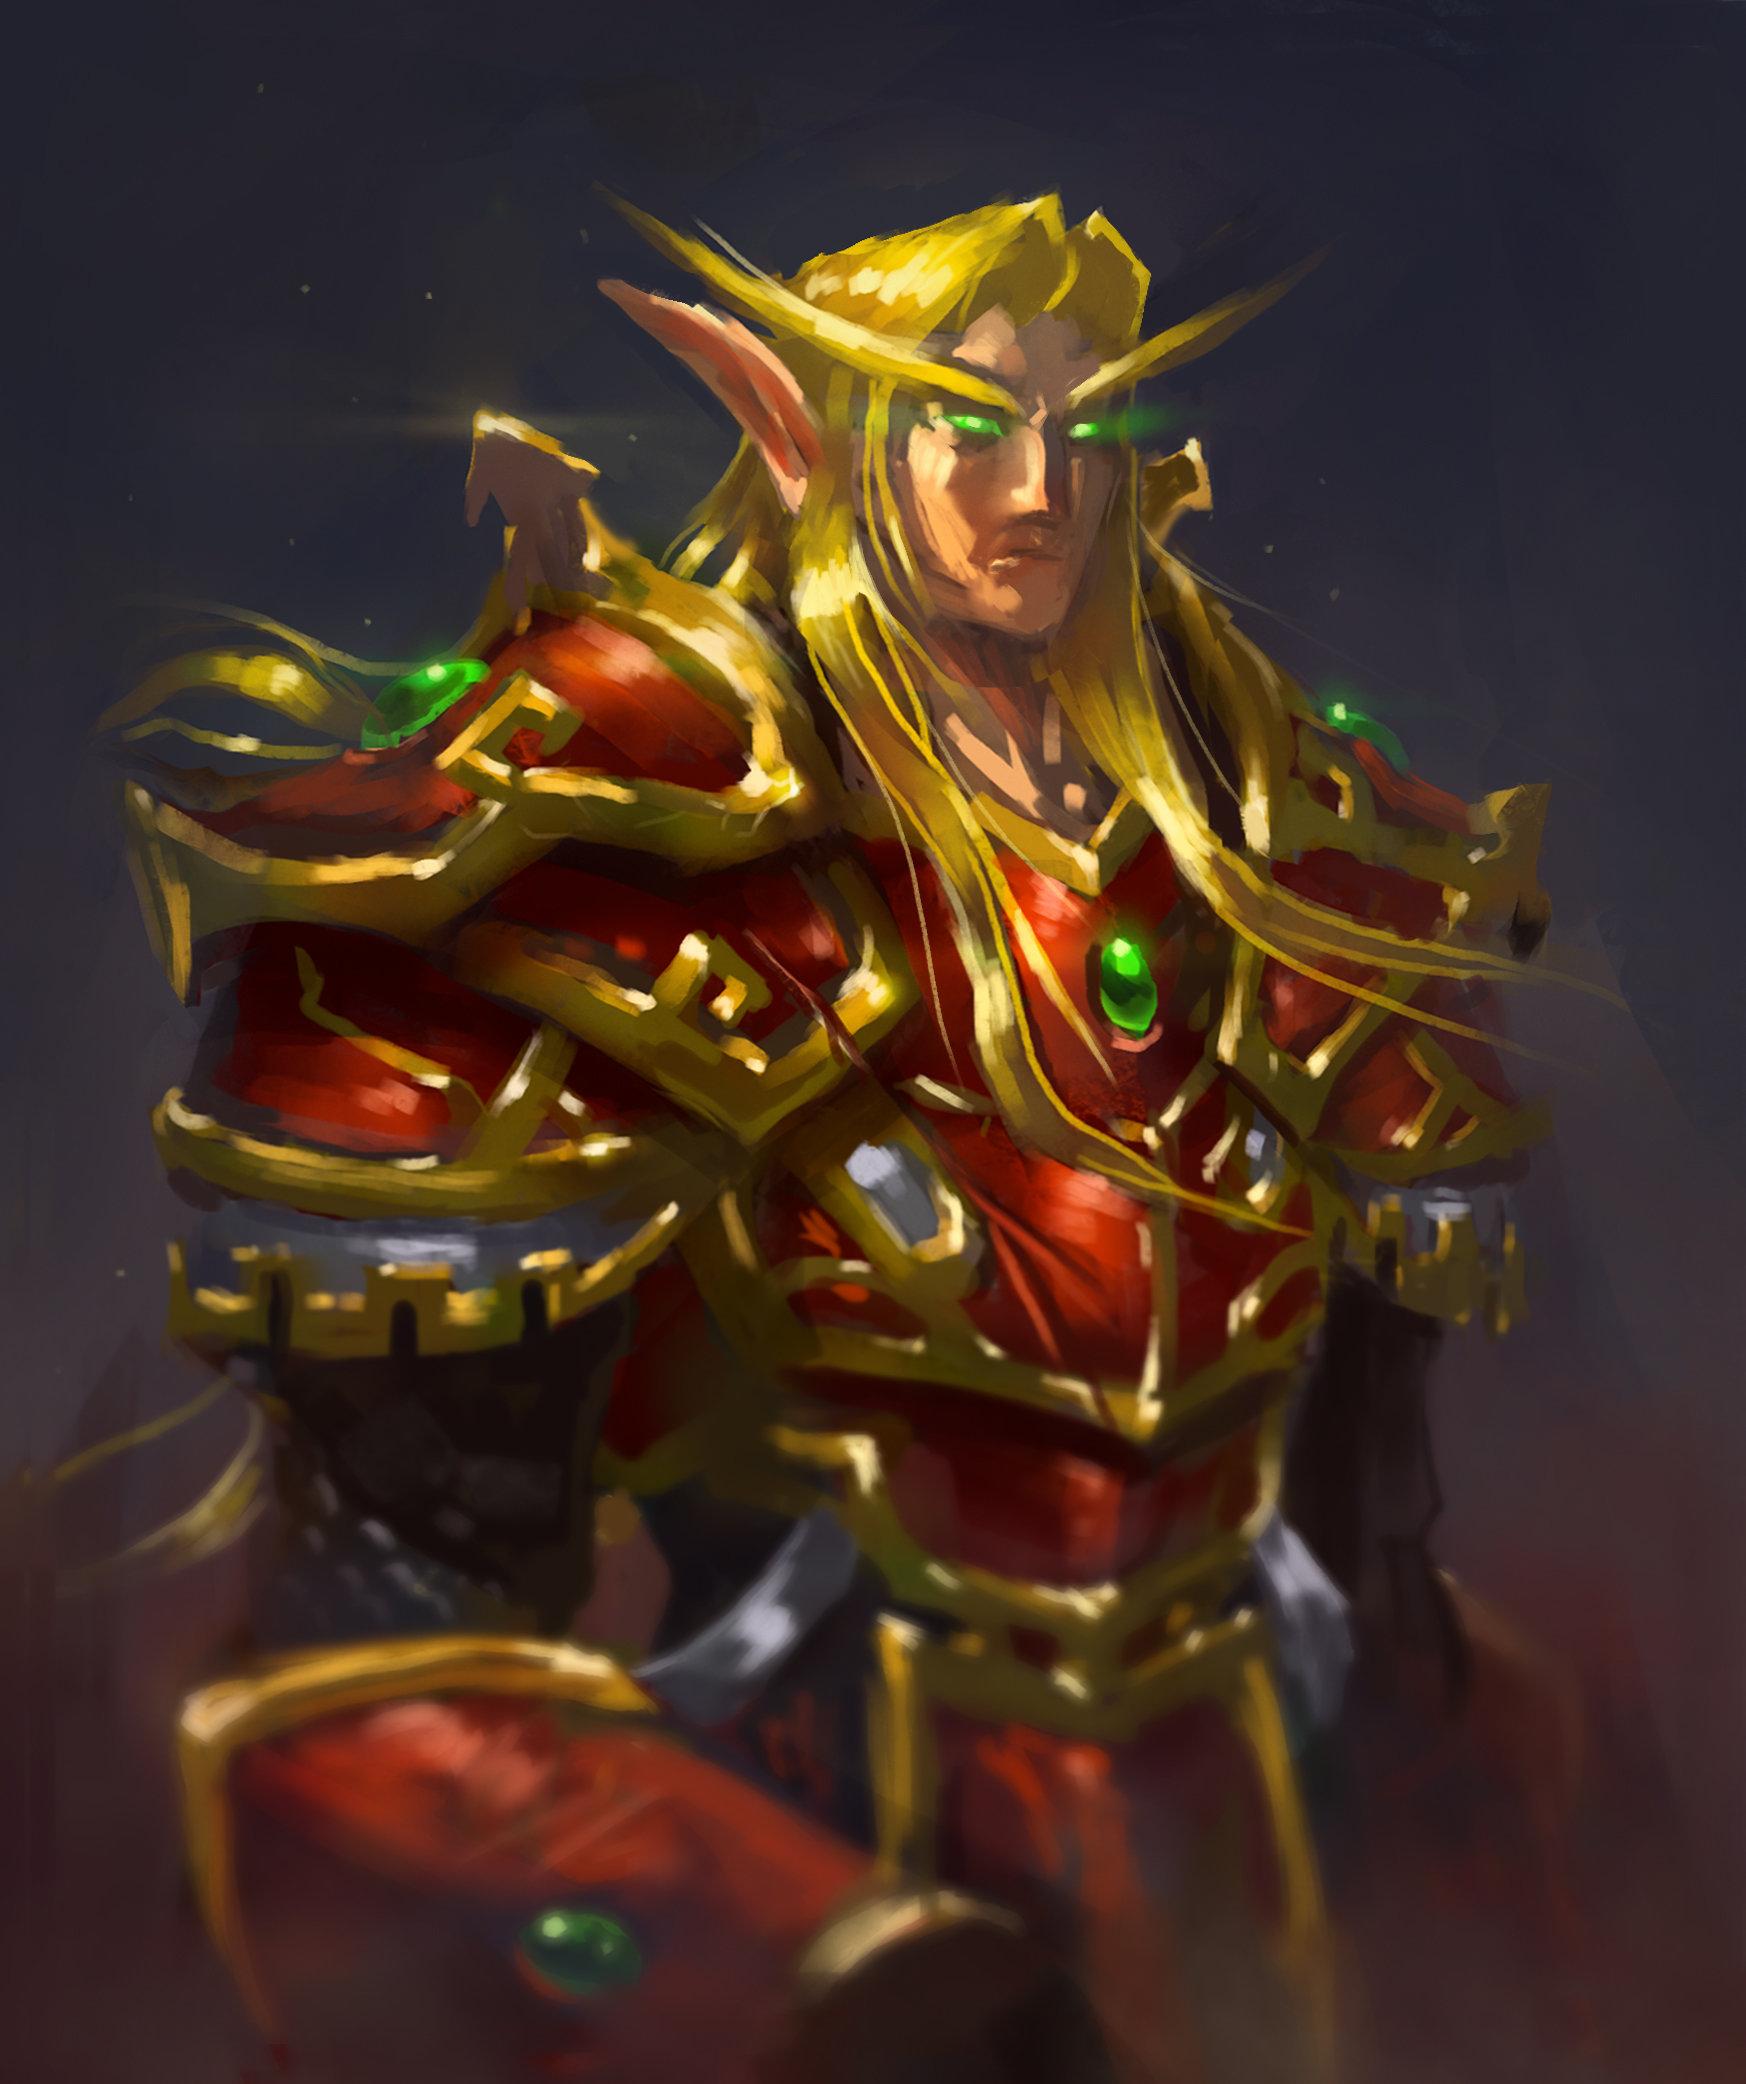 Blood Elf Concept Art